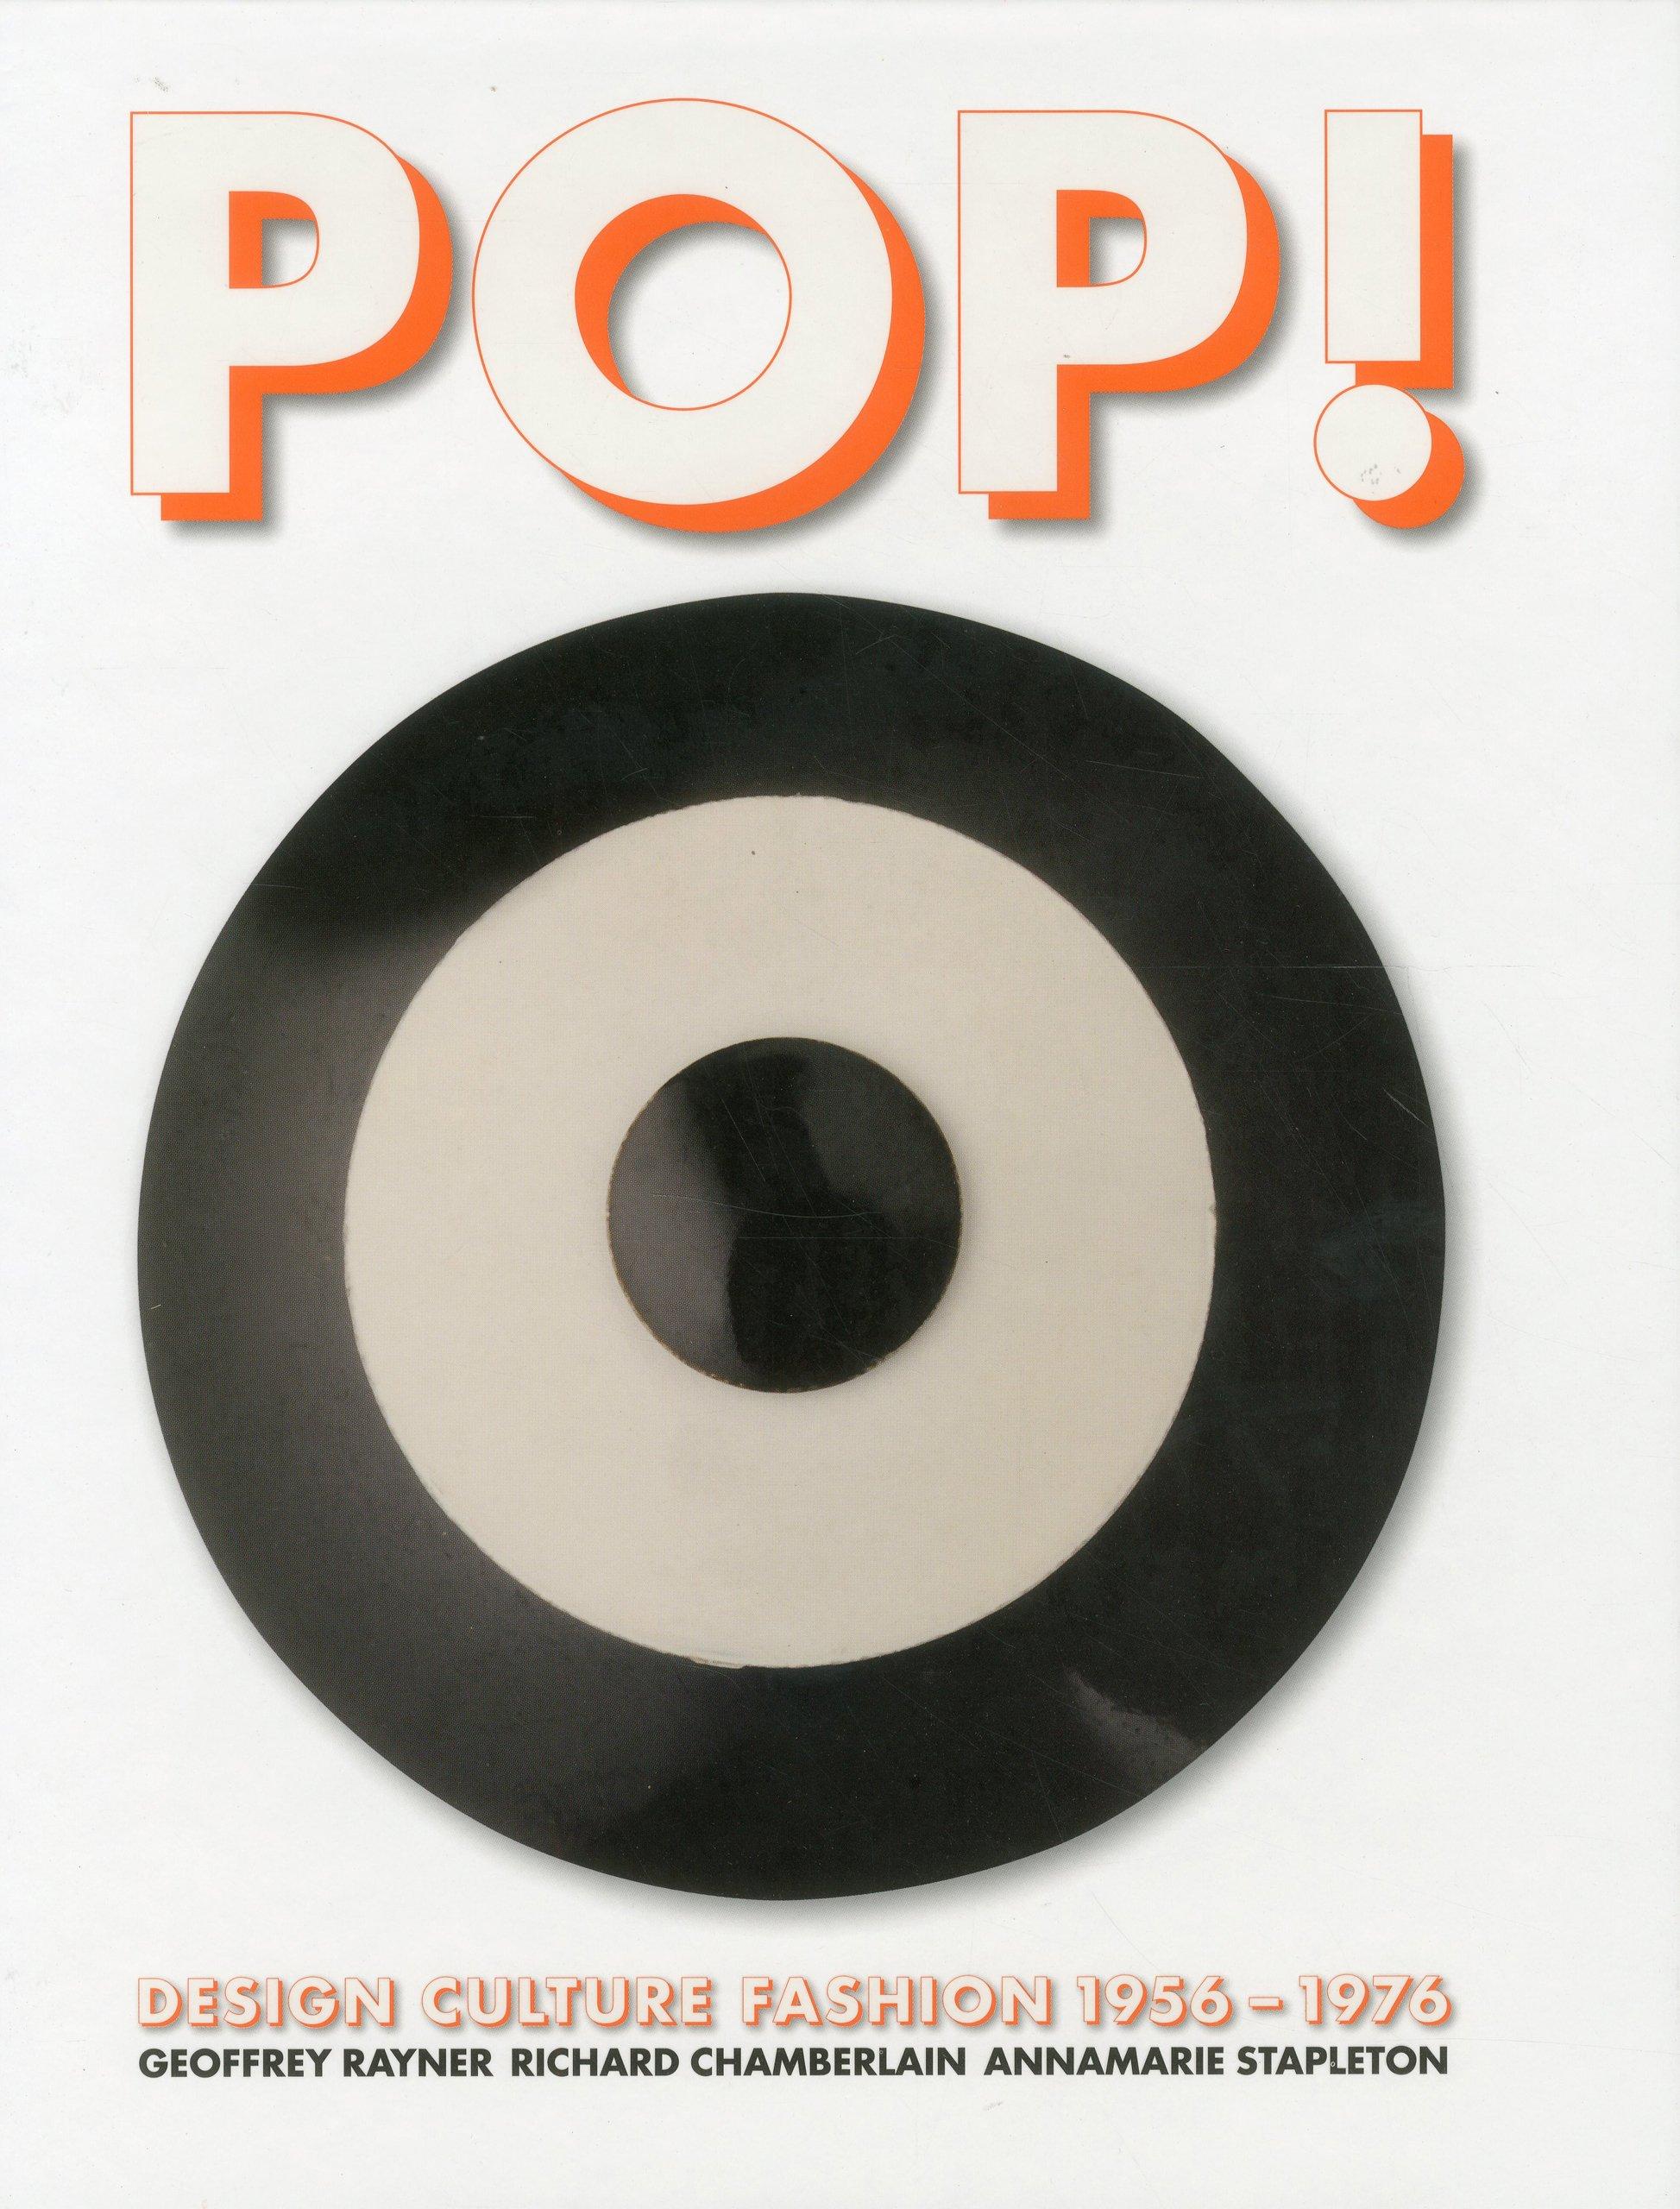 Pop Design Culture Fashion 1956 1976 Rayner Geoffrey Chamberlain Richard Stapleton Annamarie 9781851496907 Amazon Com Books